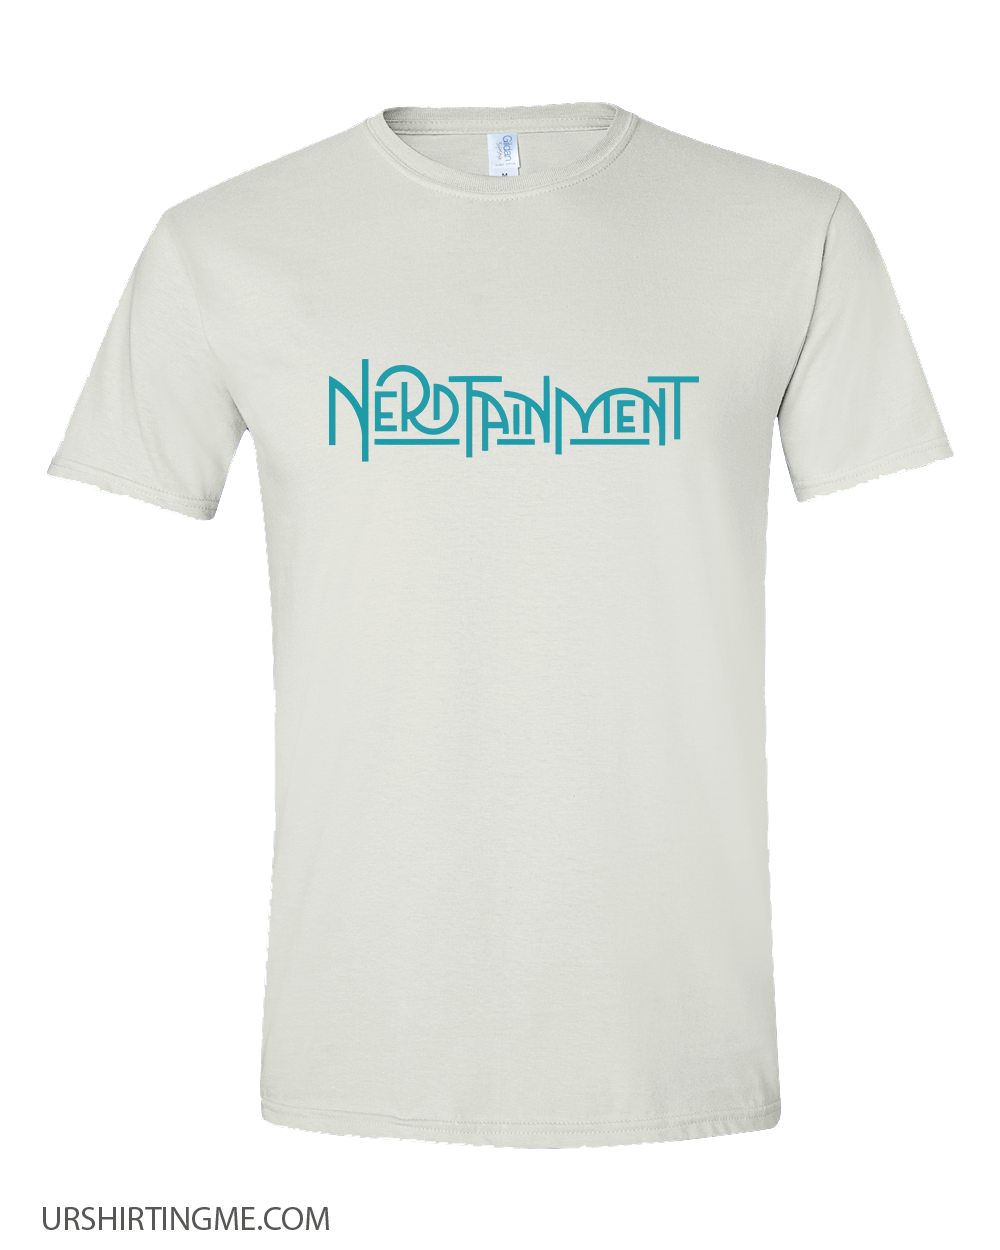 Nerdtainment Logo Teal